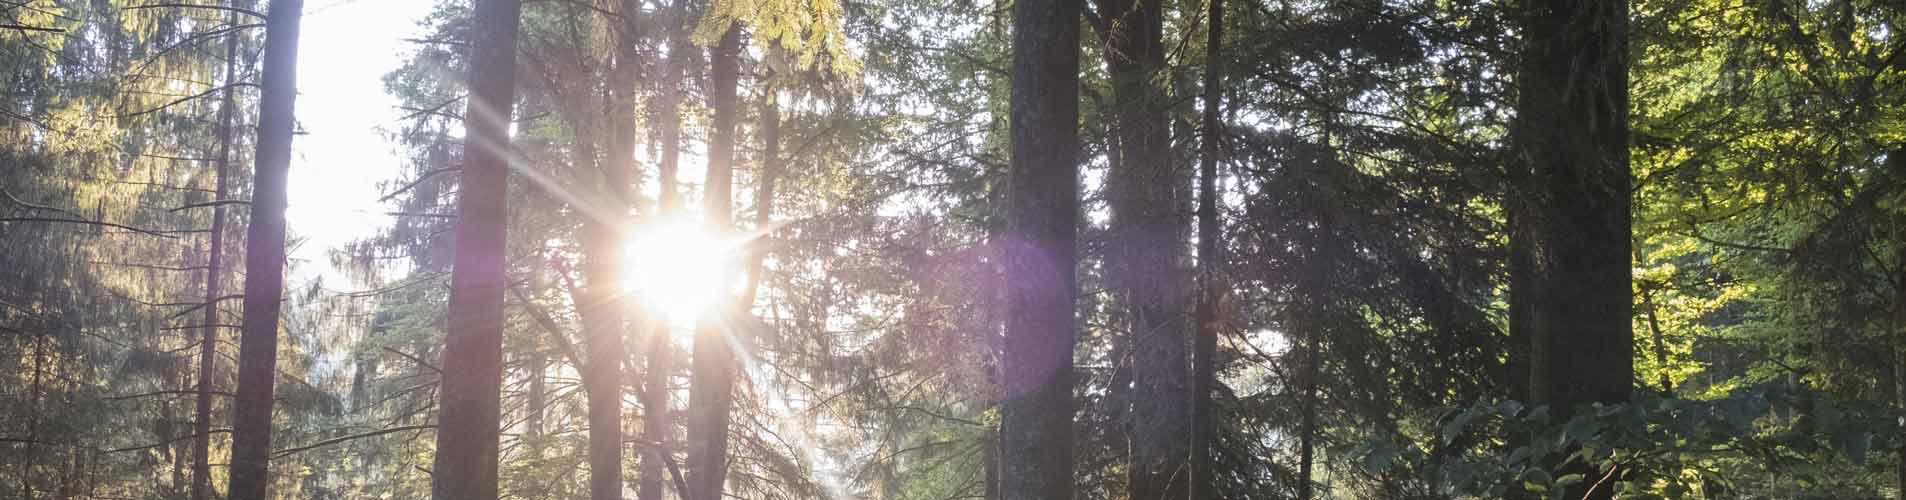 Sonne-durch-Bäume